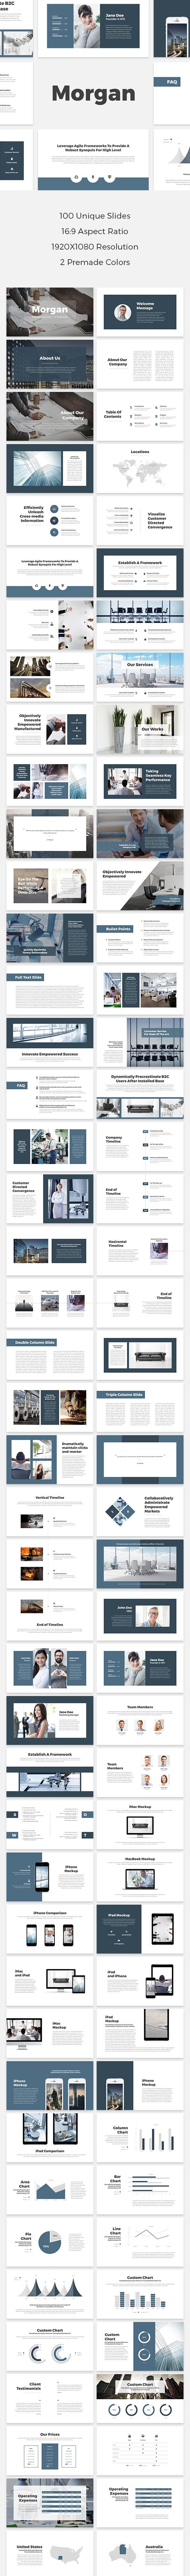 Morgan PowerPoint Template - PowerPoint Templates Presentation Templates